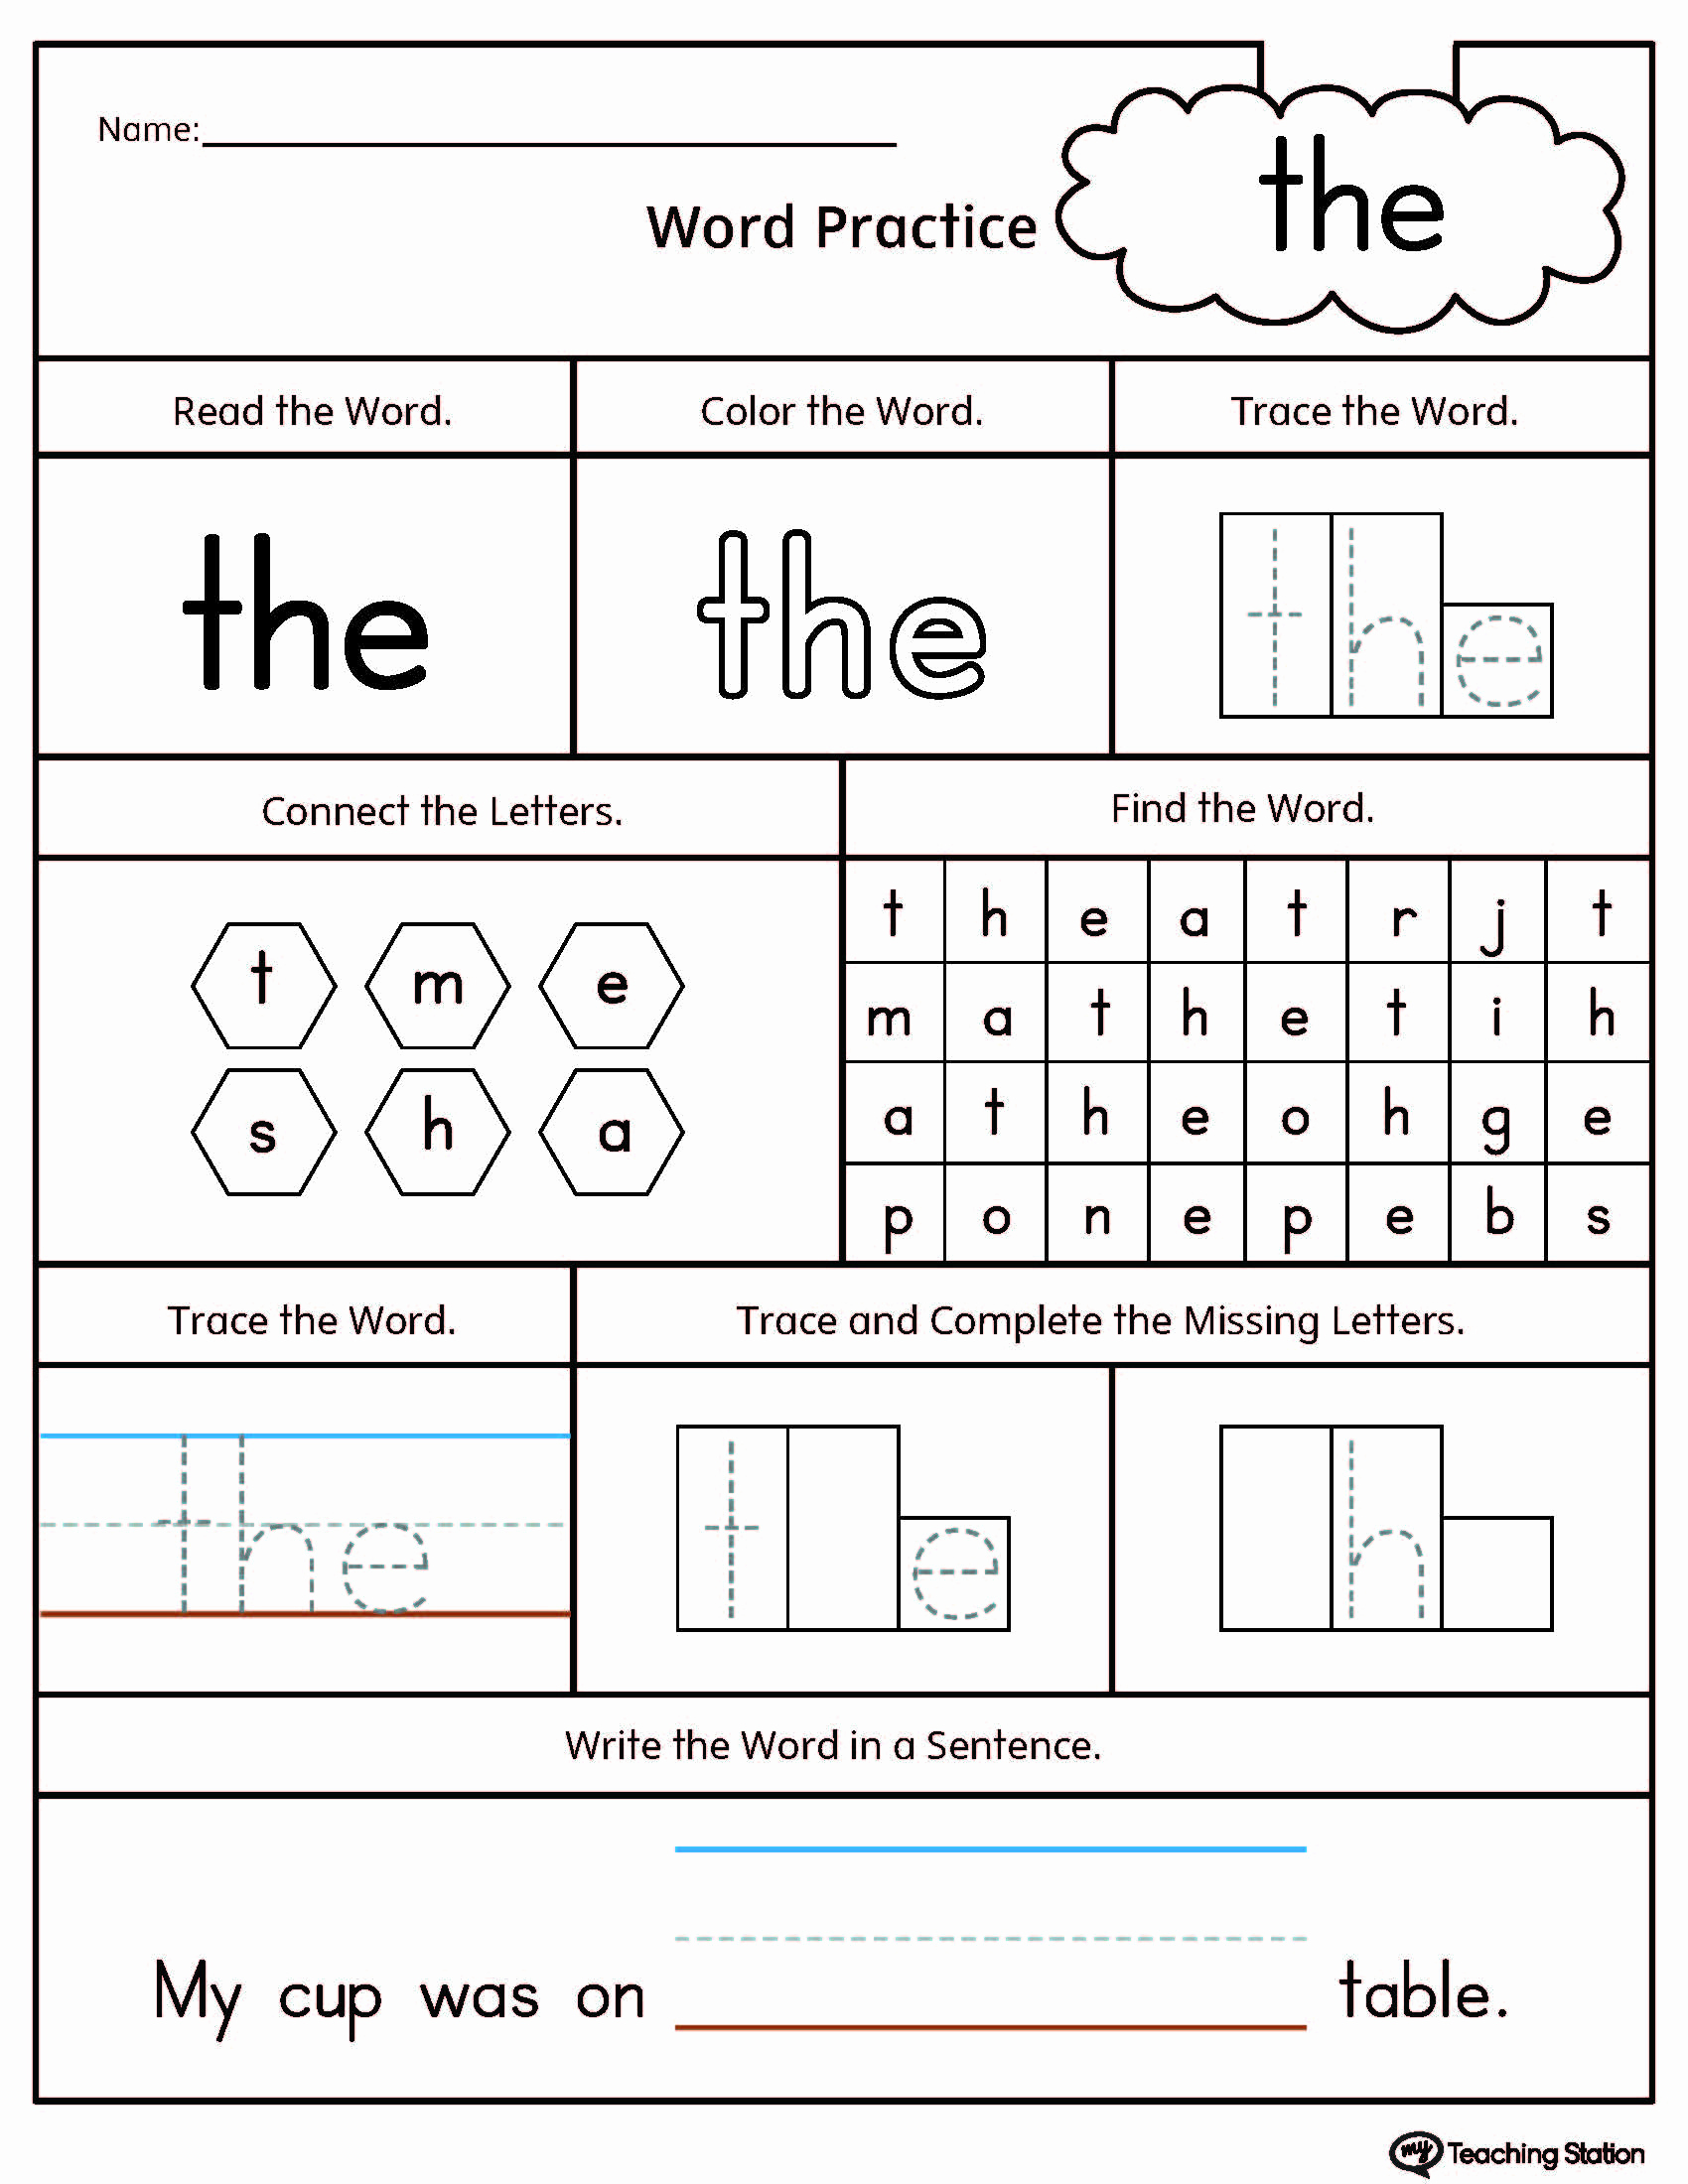 Positional Words Worksheets for Preschool Beautiful 20 Positional Words Preschool Worksheets